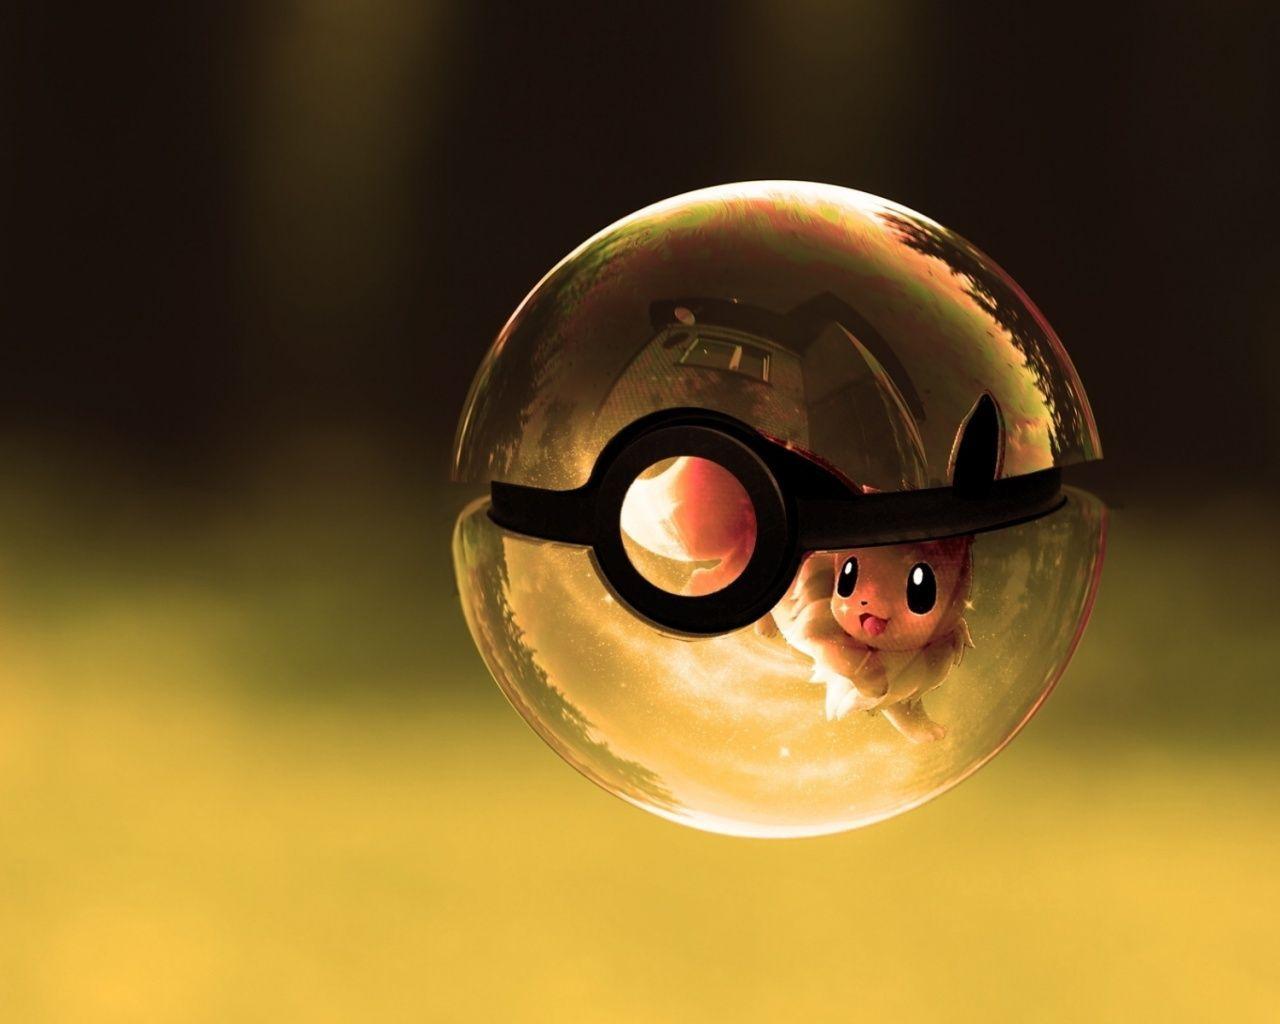 Pokemon Go Pokemon Go Wallpaper Pokemon Go